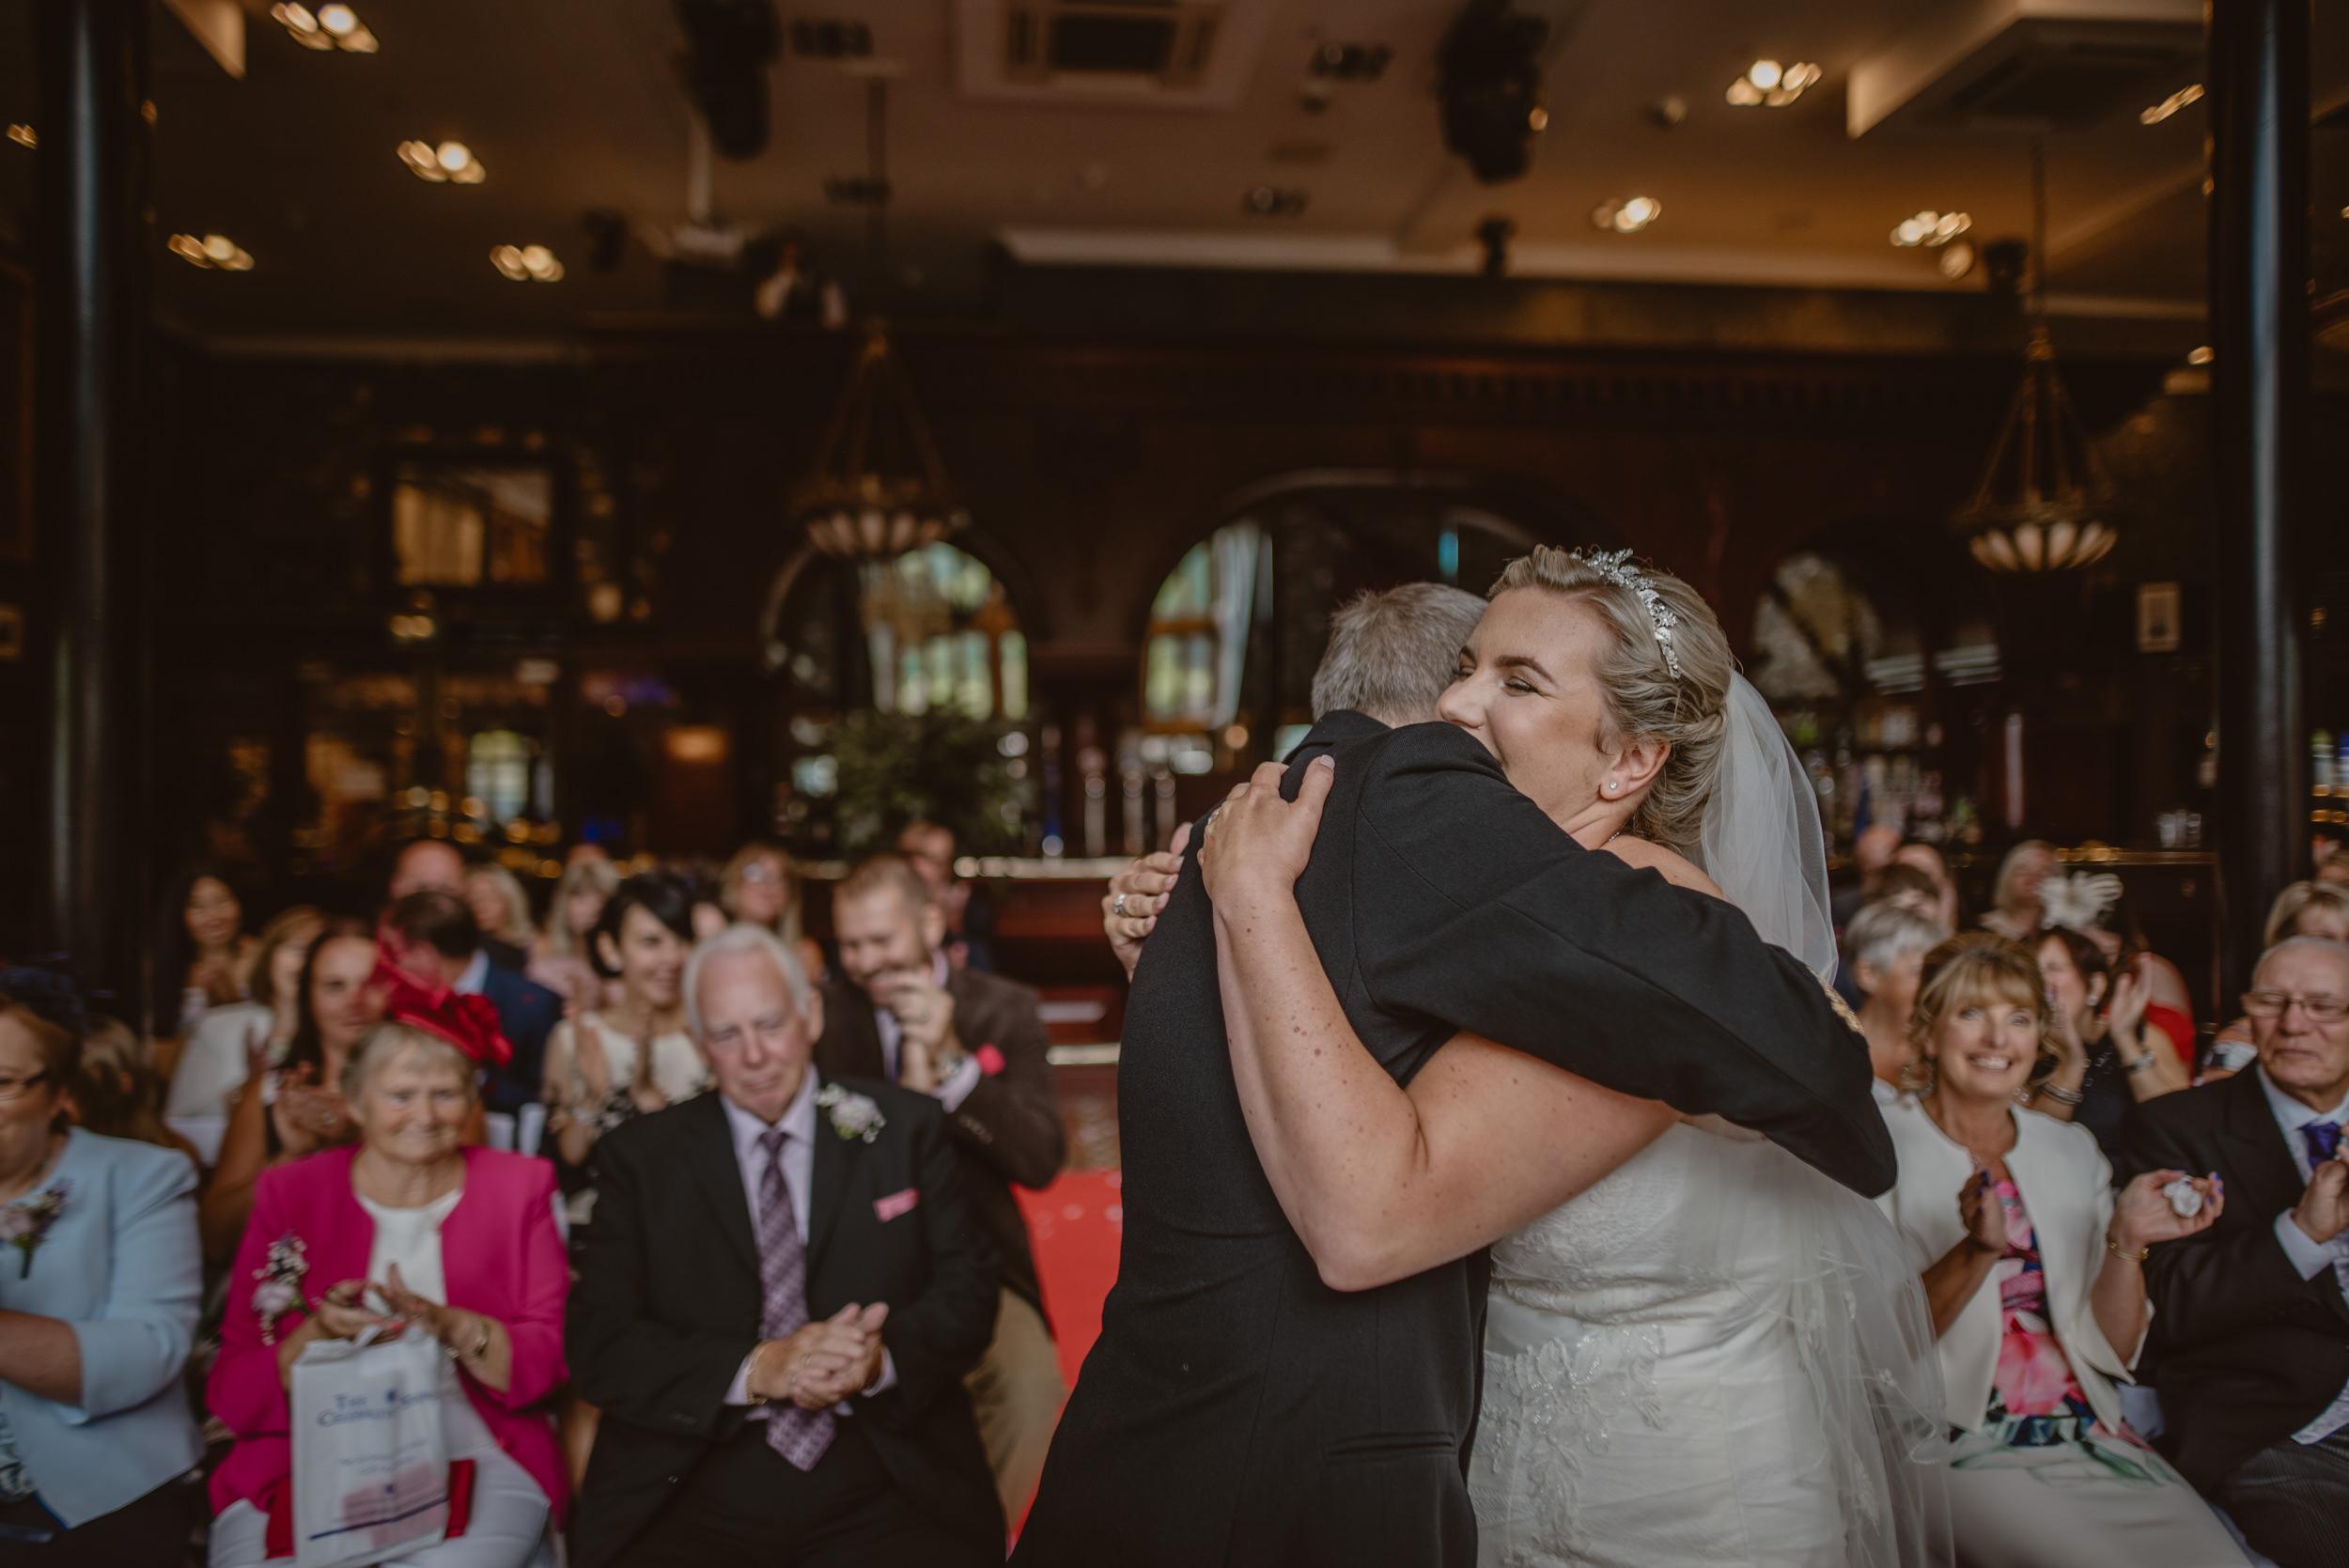 Chantelle-and-Stephen-Old-Thorns-Hotel-Wedding-Liphook-Manu-Mendoza-Wedding-Photography-230.jpg